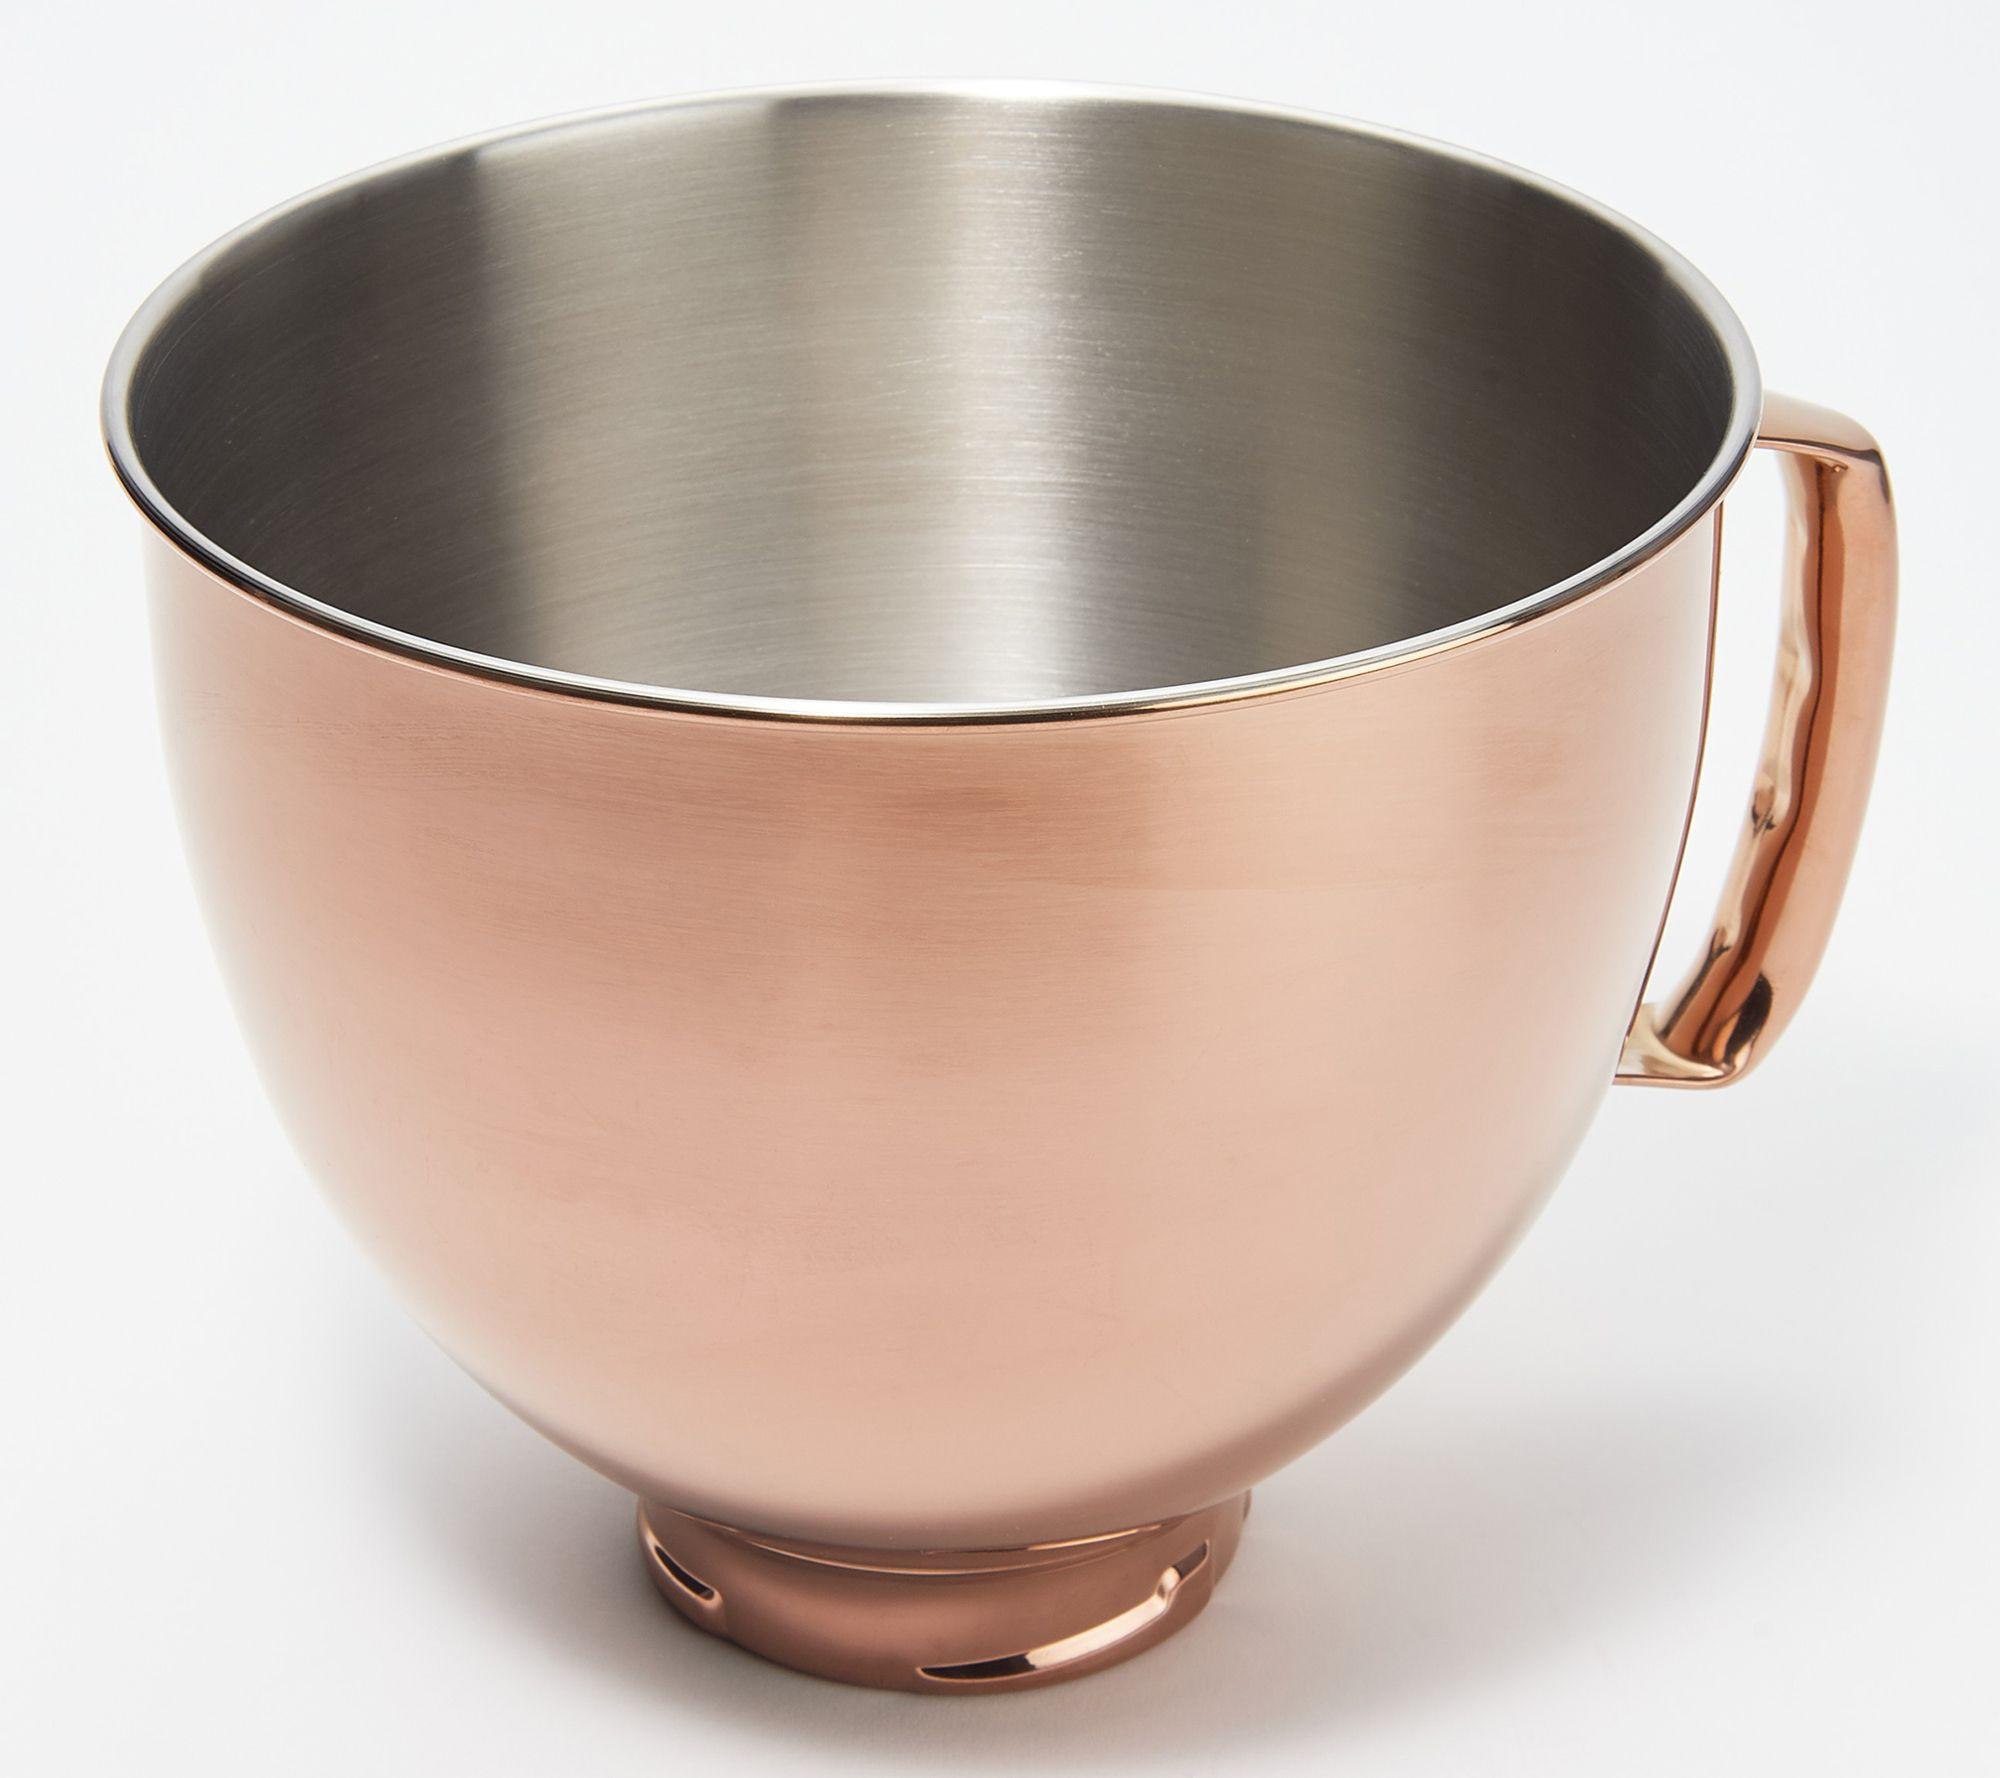 Kitchenaid 5 Qt Radiant Stainless Steel Mixing Bowl Qvc Com